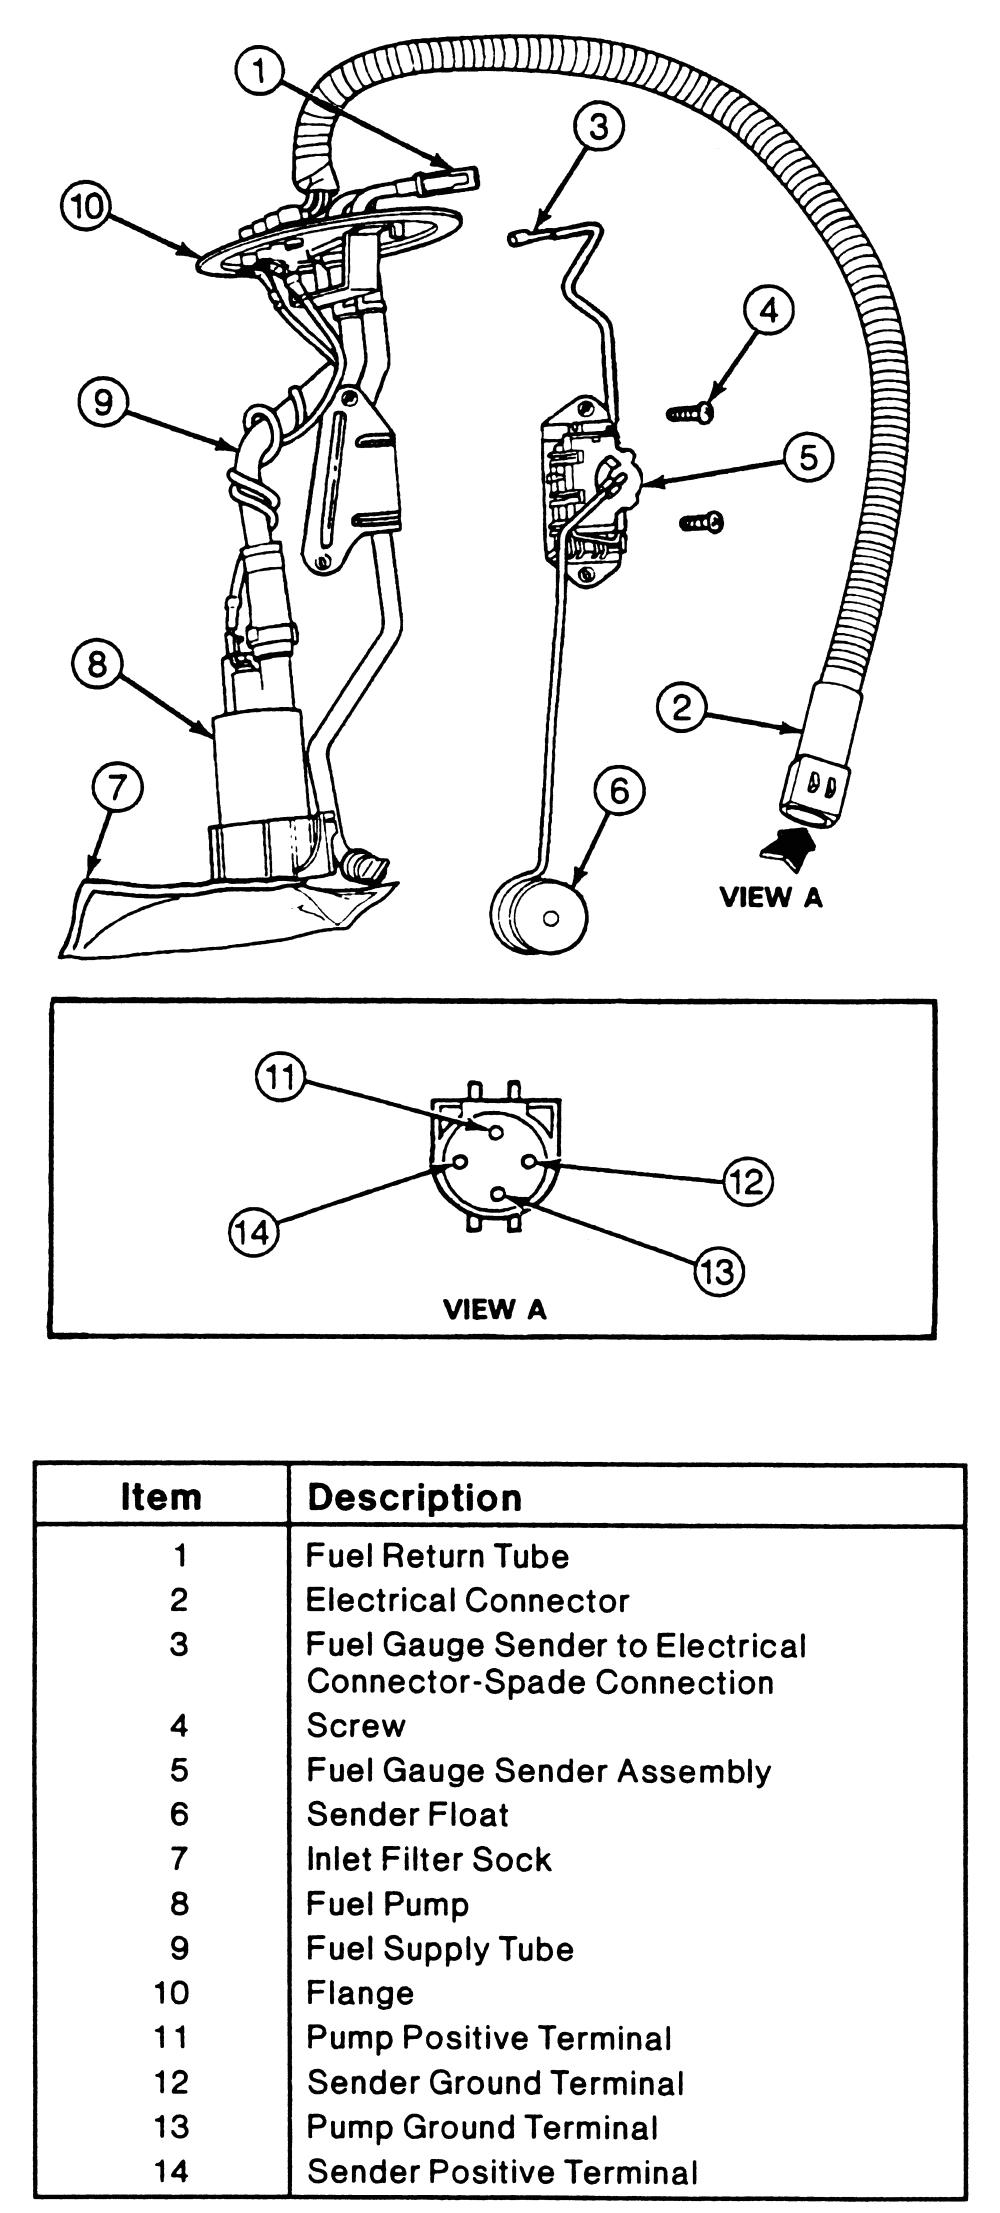 Ford Ranger Fuel Pump Wiring Diagram Wrg 1907 ford Ranger Fuel Gauge Wiring Diagram